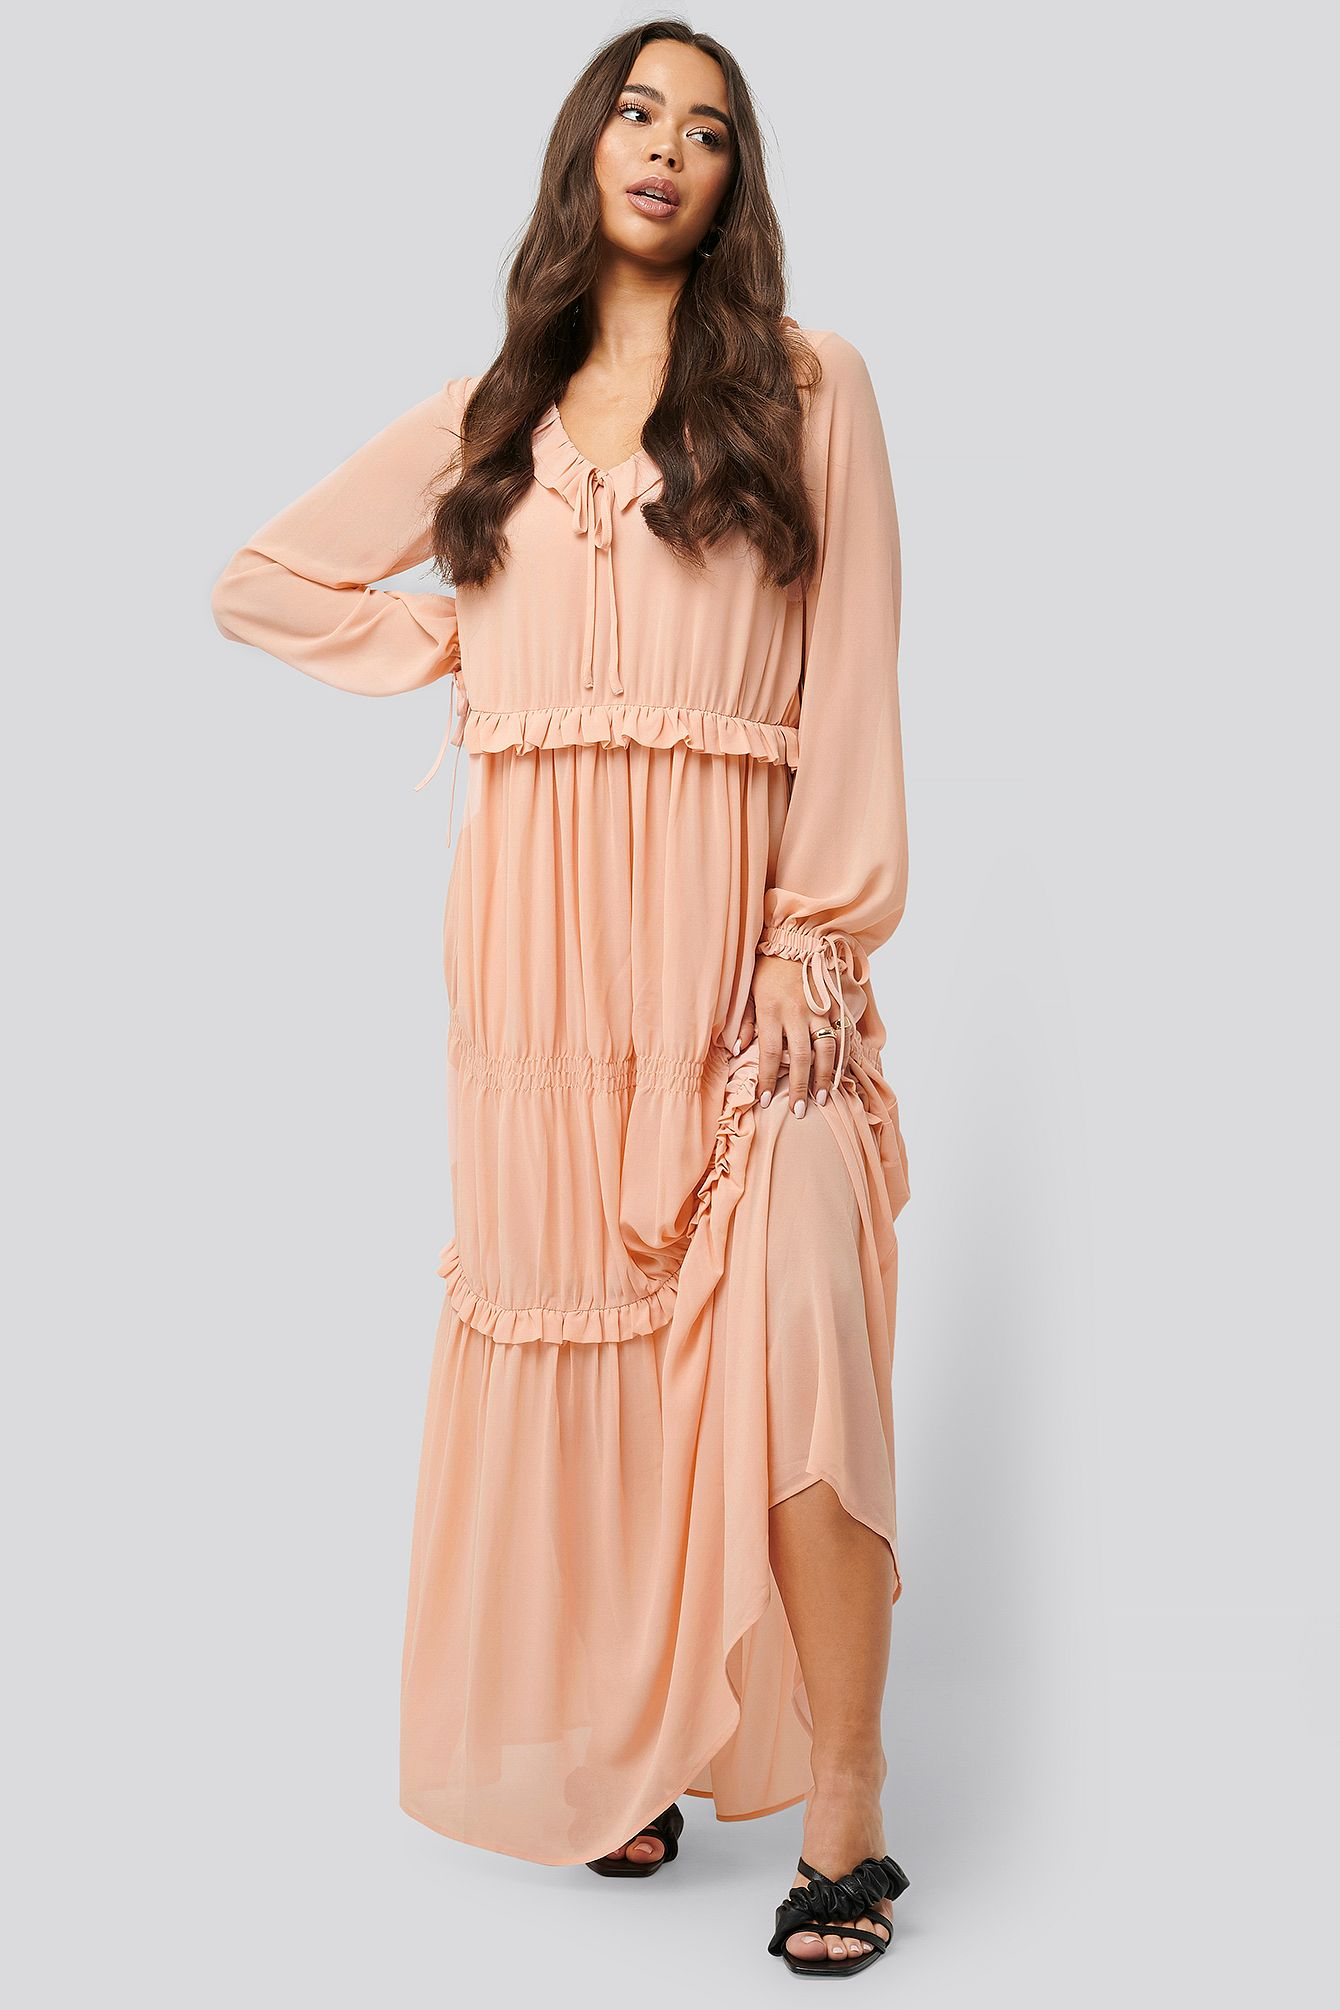 Multi Frill Flowy Dress Rosa